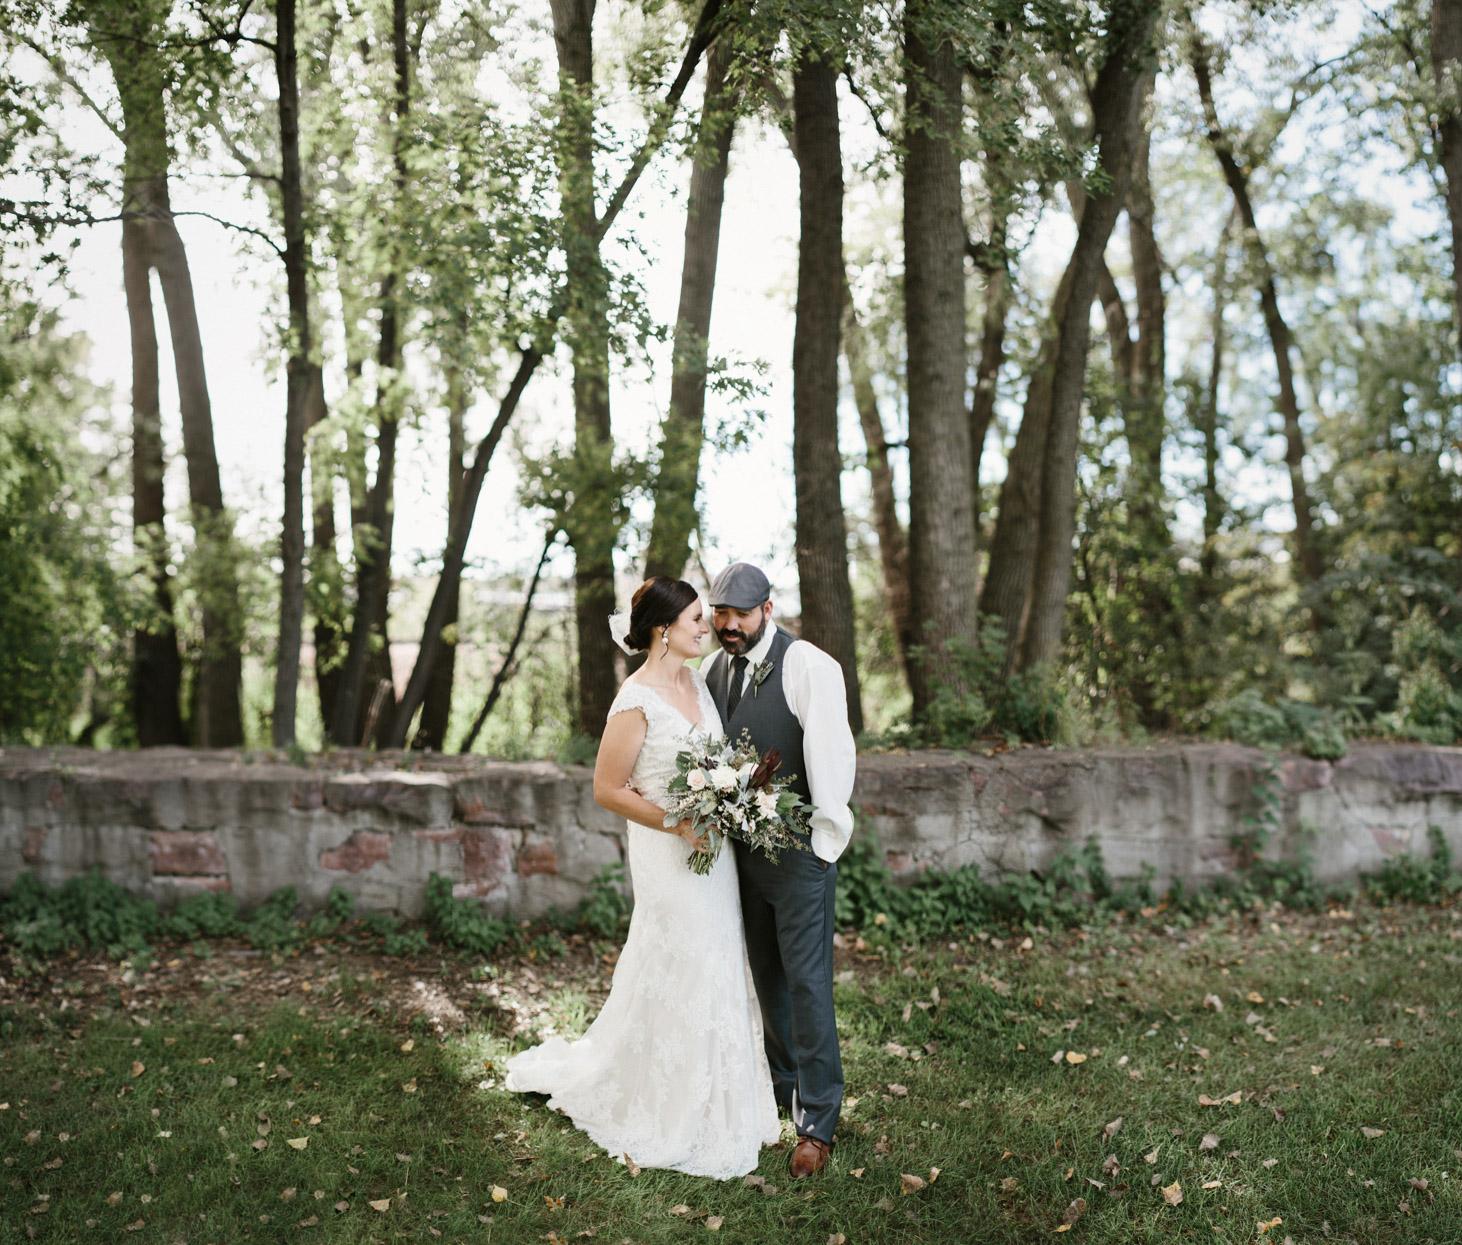 sioux_falls_desmoines_wedding_photographer_28.jpg